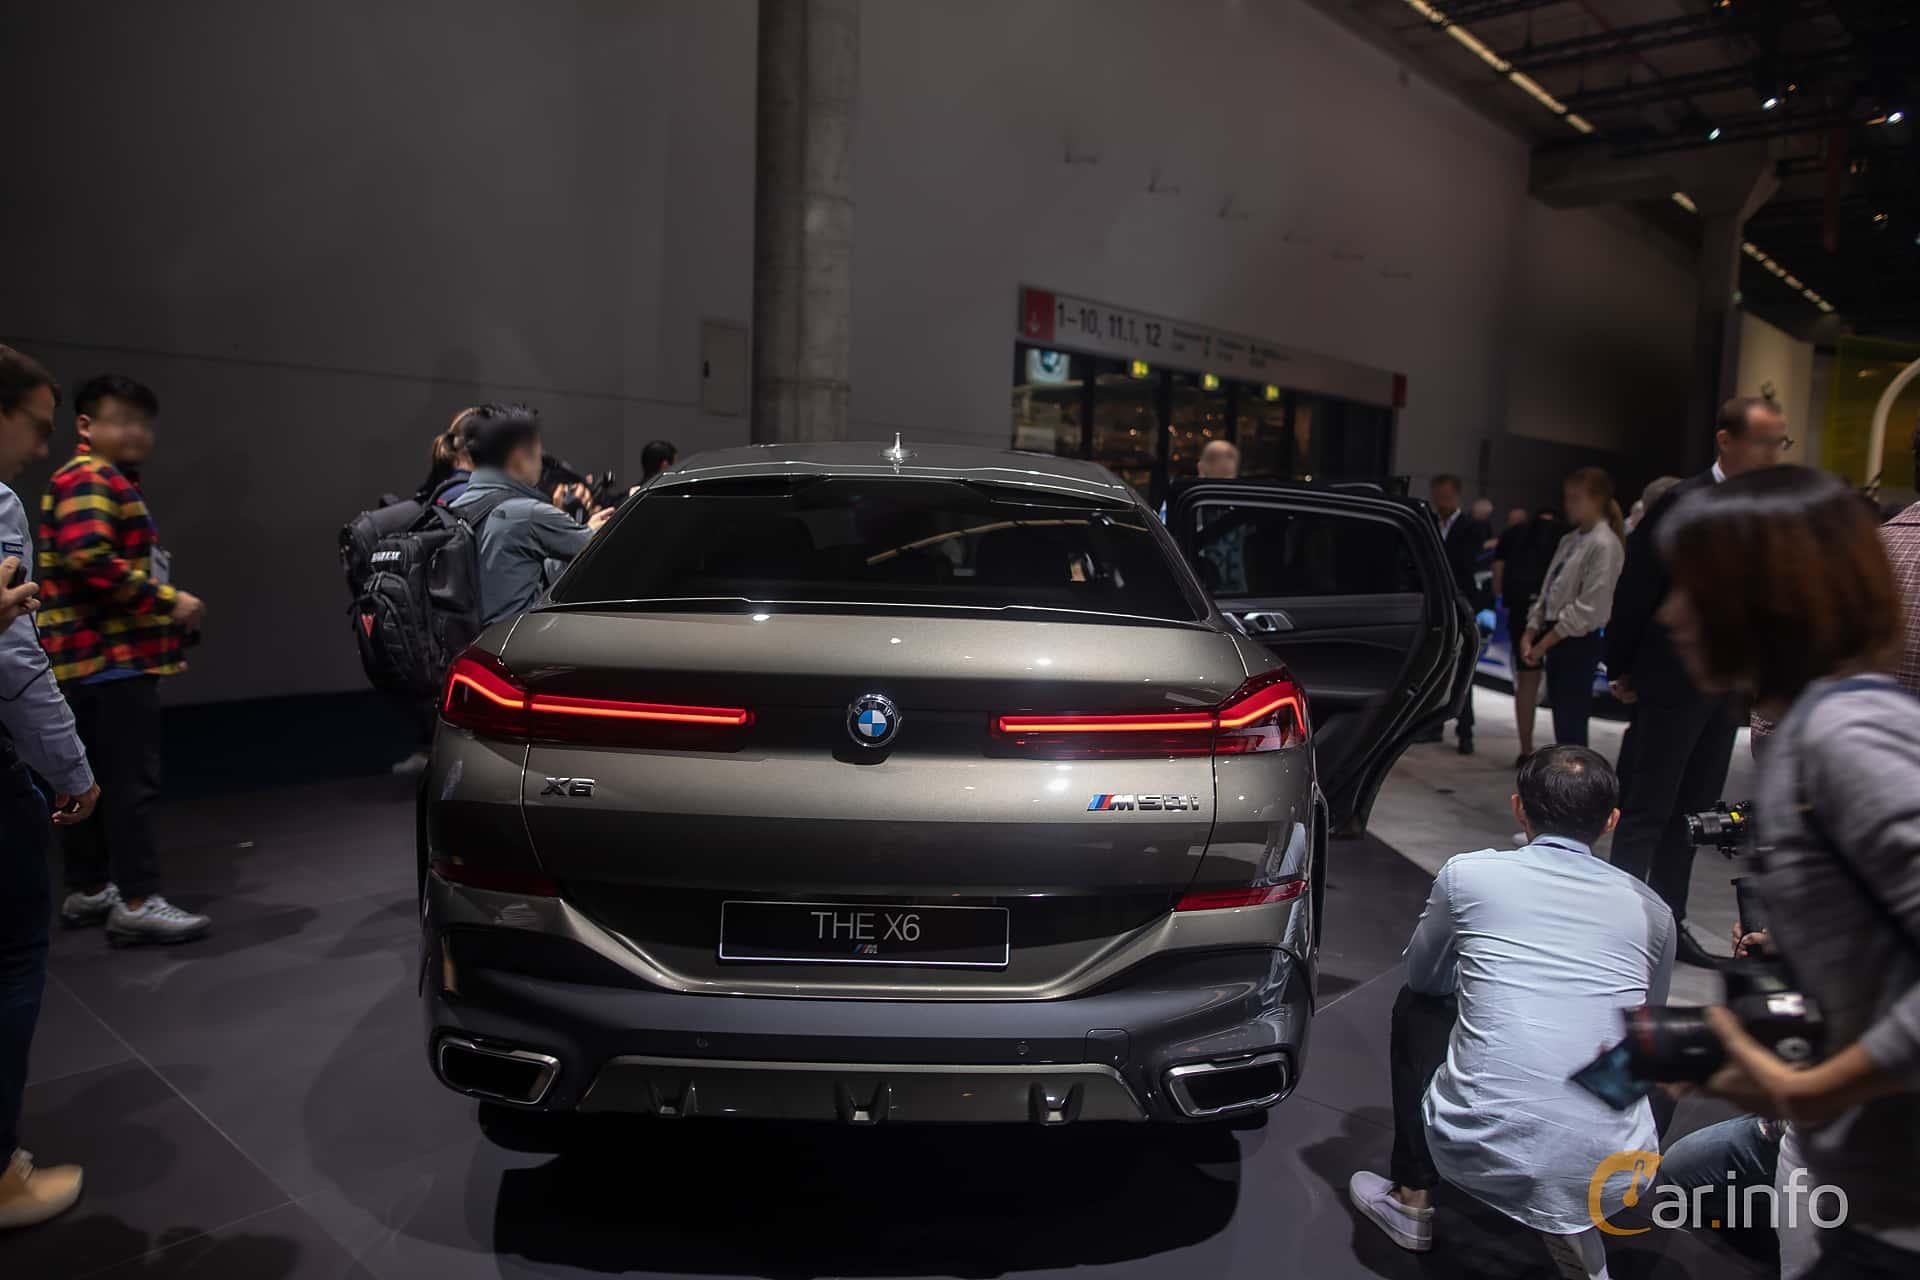 BMW X6 M50i  Steptronic, 530hp, 2020 at IAA 2019